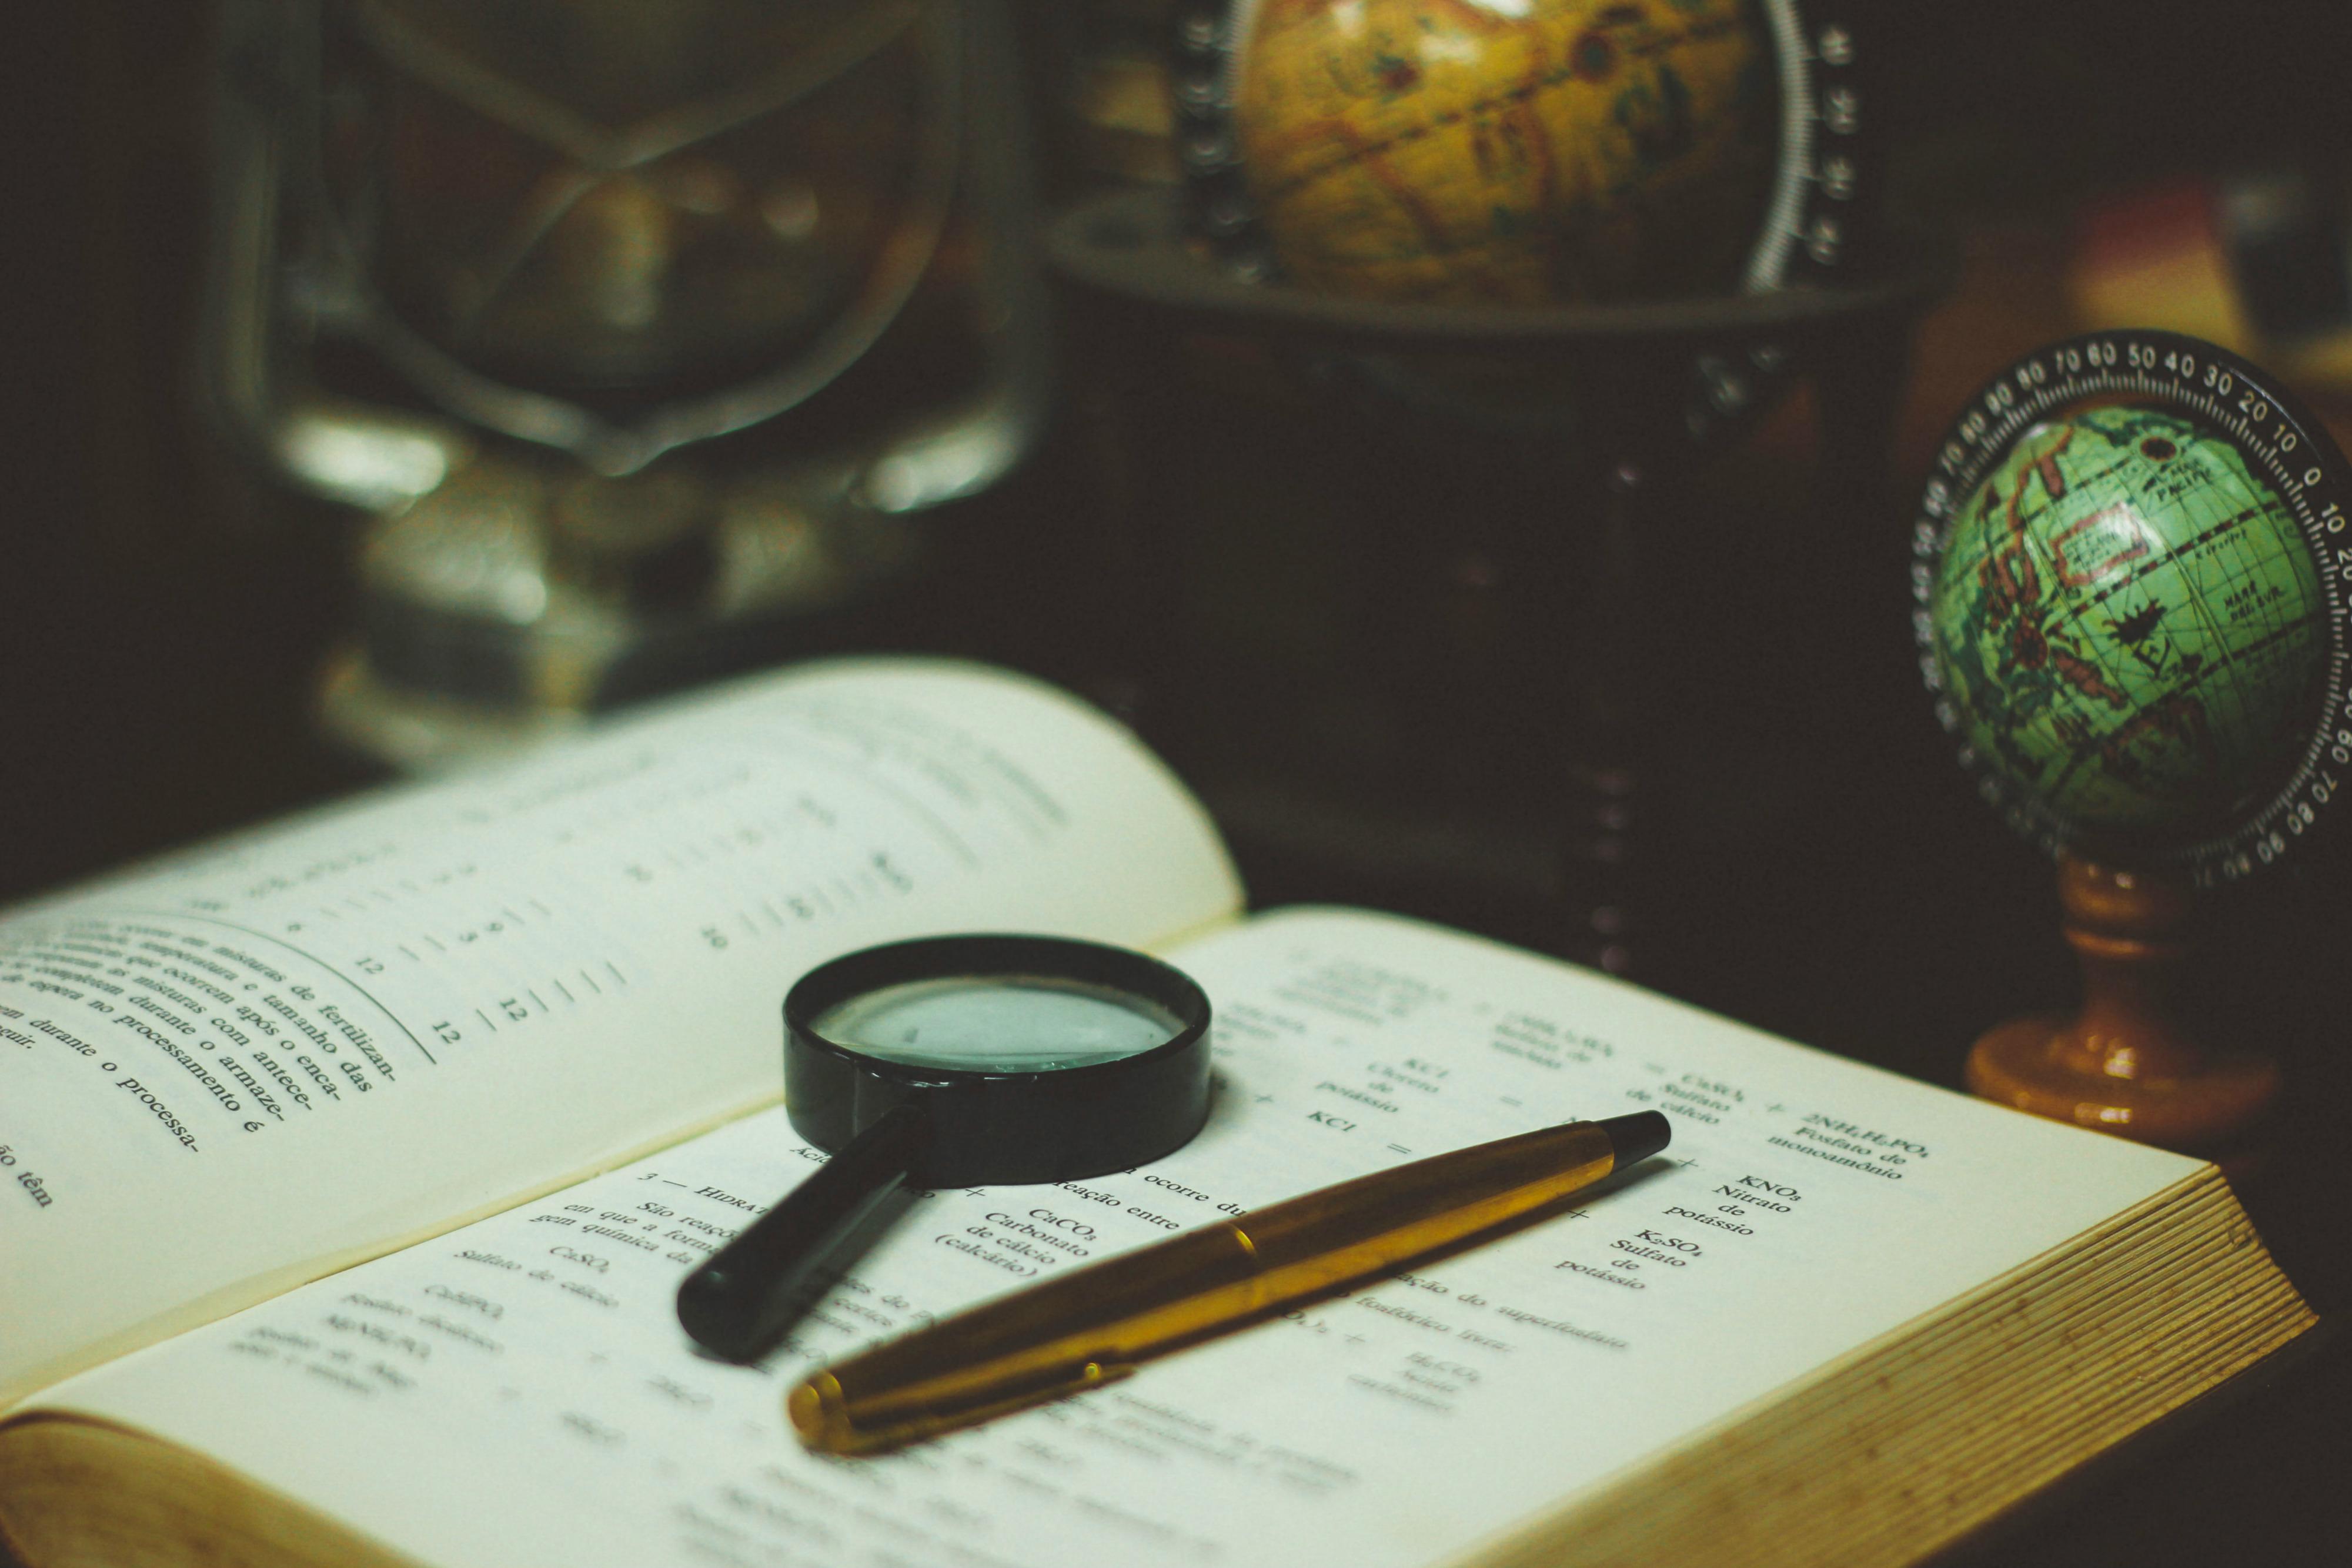 Examining a Quantitative Study Through the Lens of Mixed Methods (An EDCI 515 Assignment)